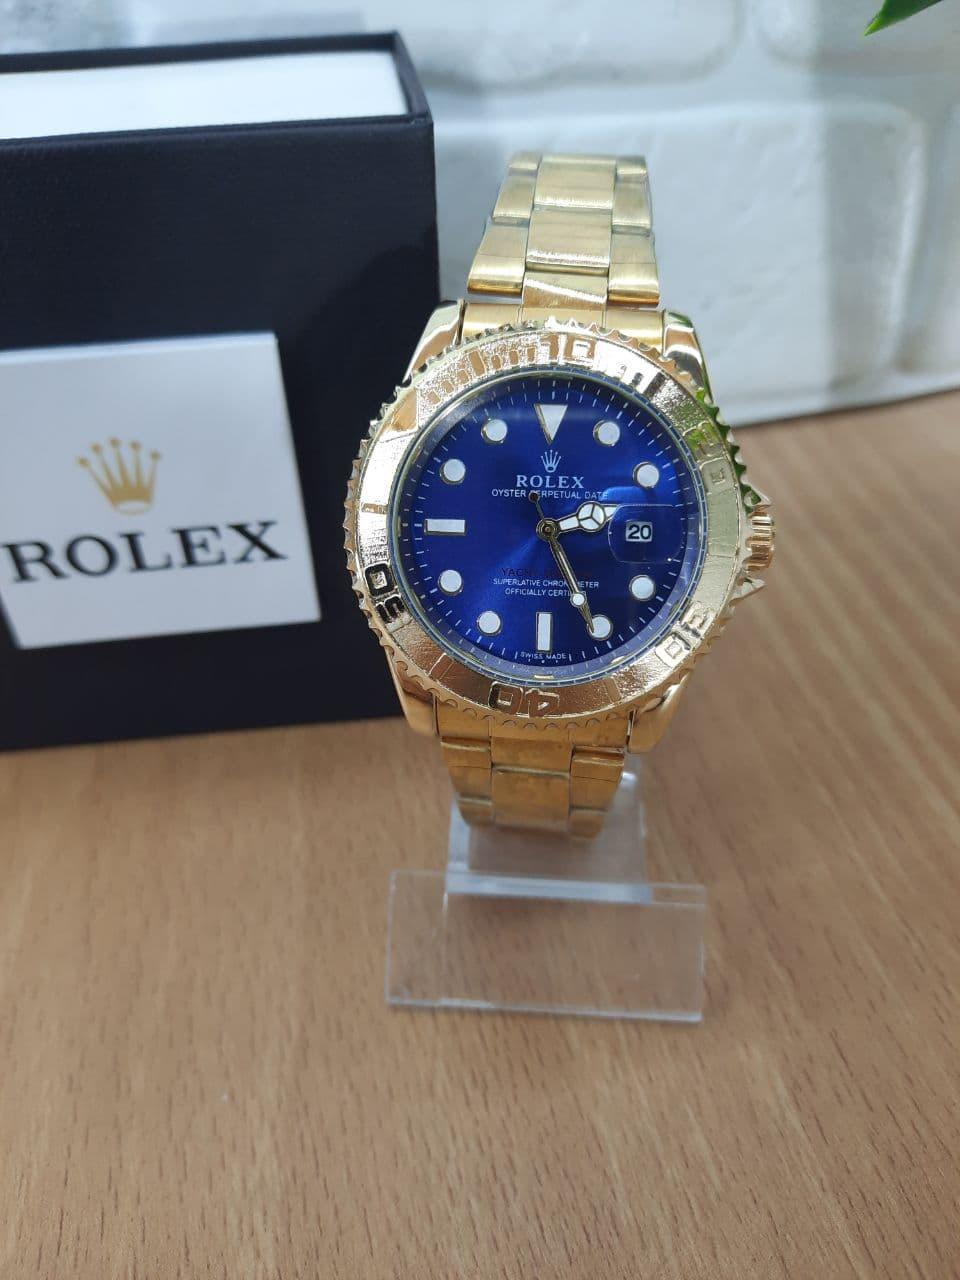 Мужские часы реплика Rolex Oyster Perpetual Ролекс ( Gold/Blue)